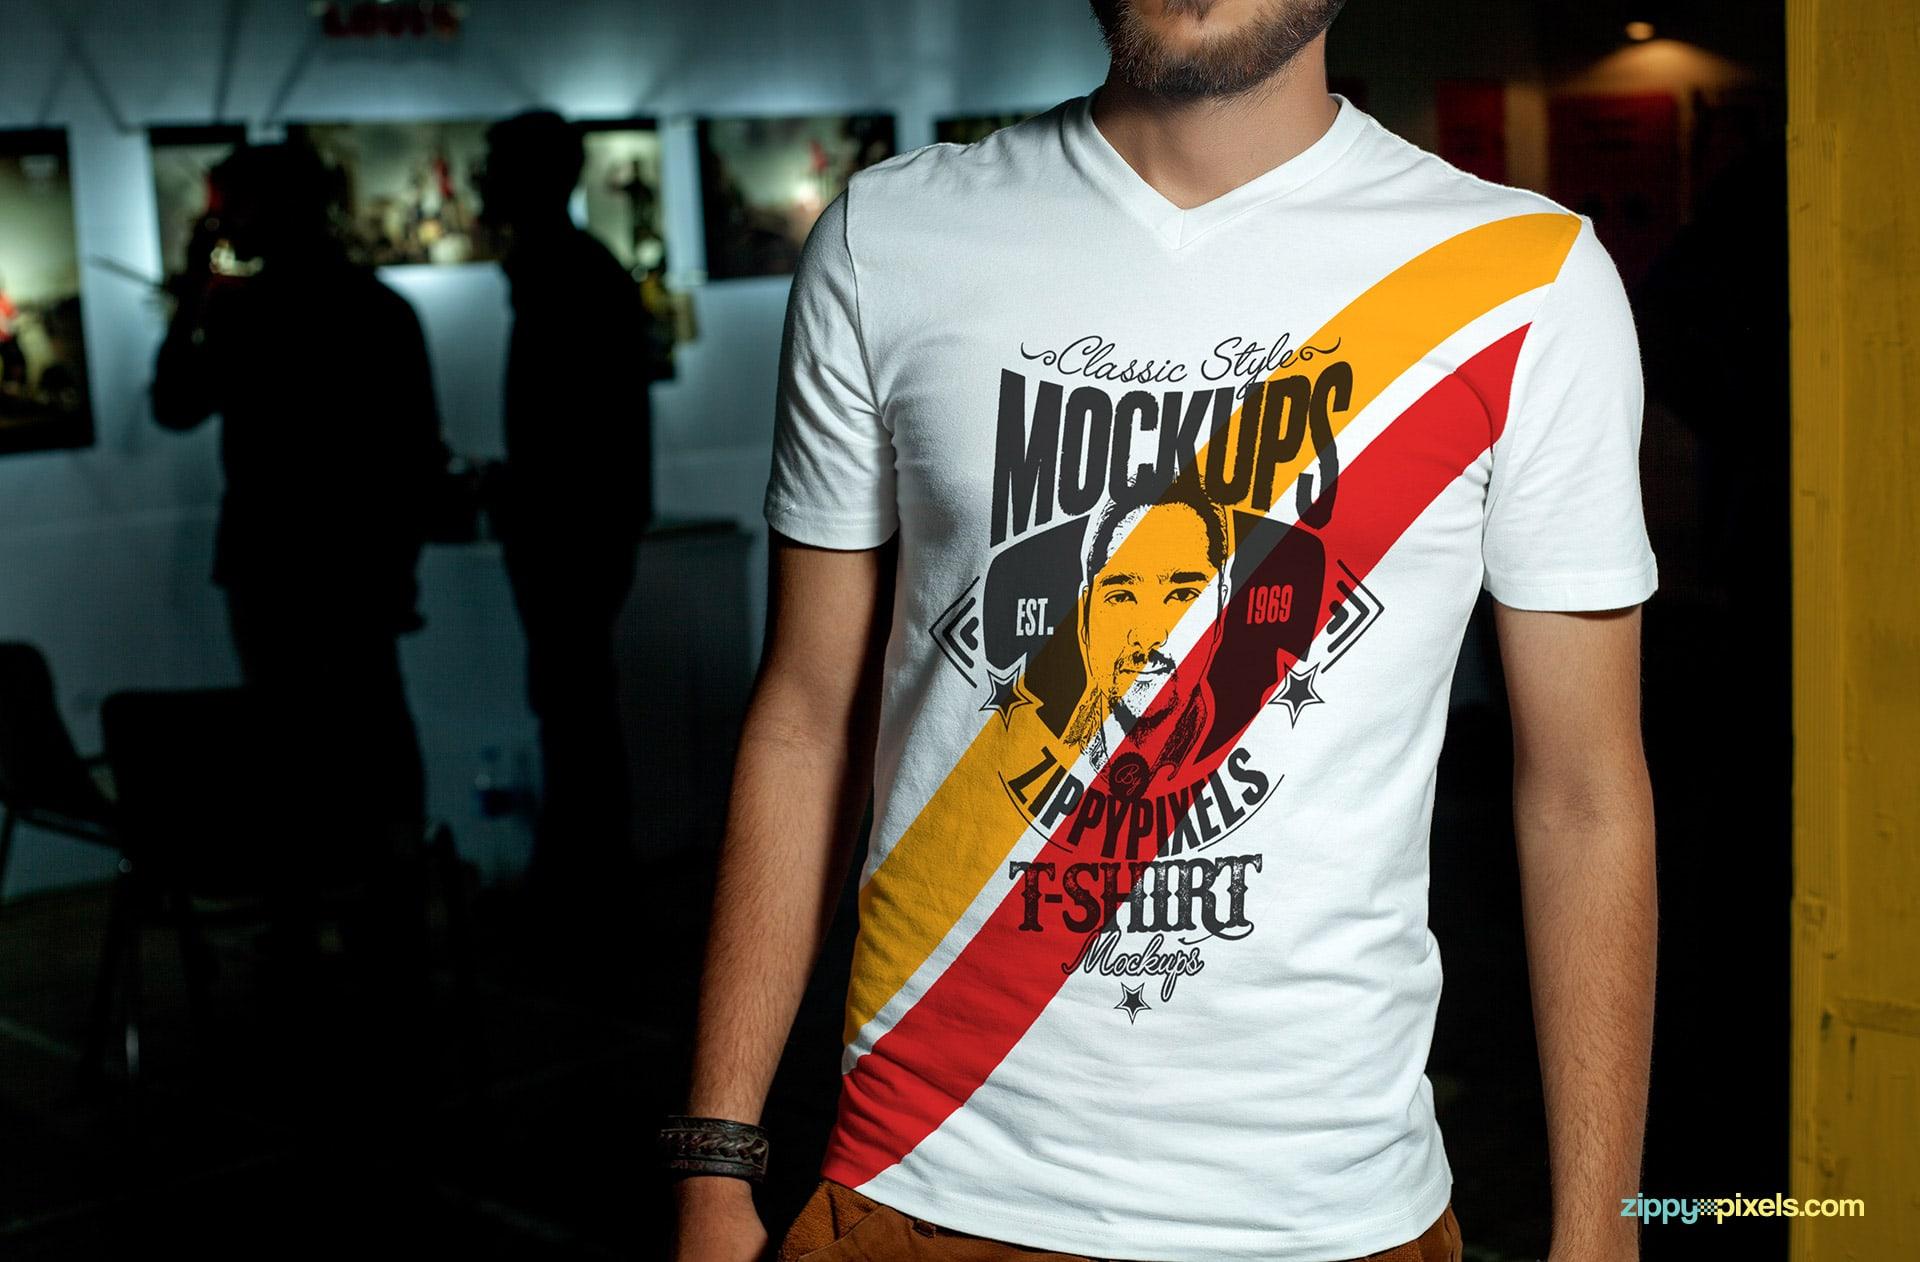 Photorealistic Tee-shirt mockup PSD